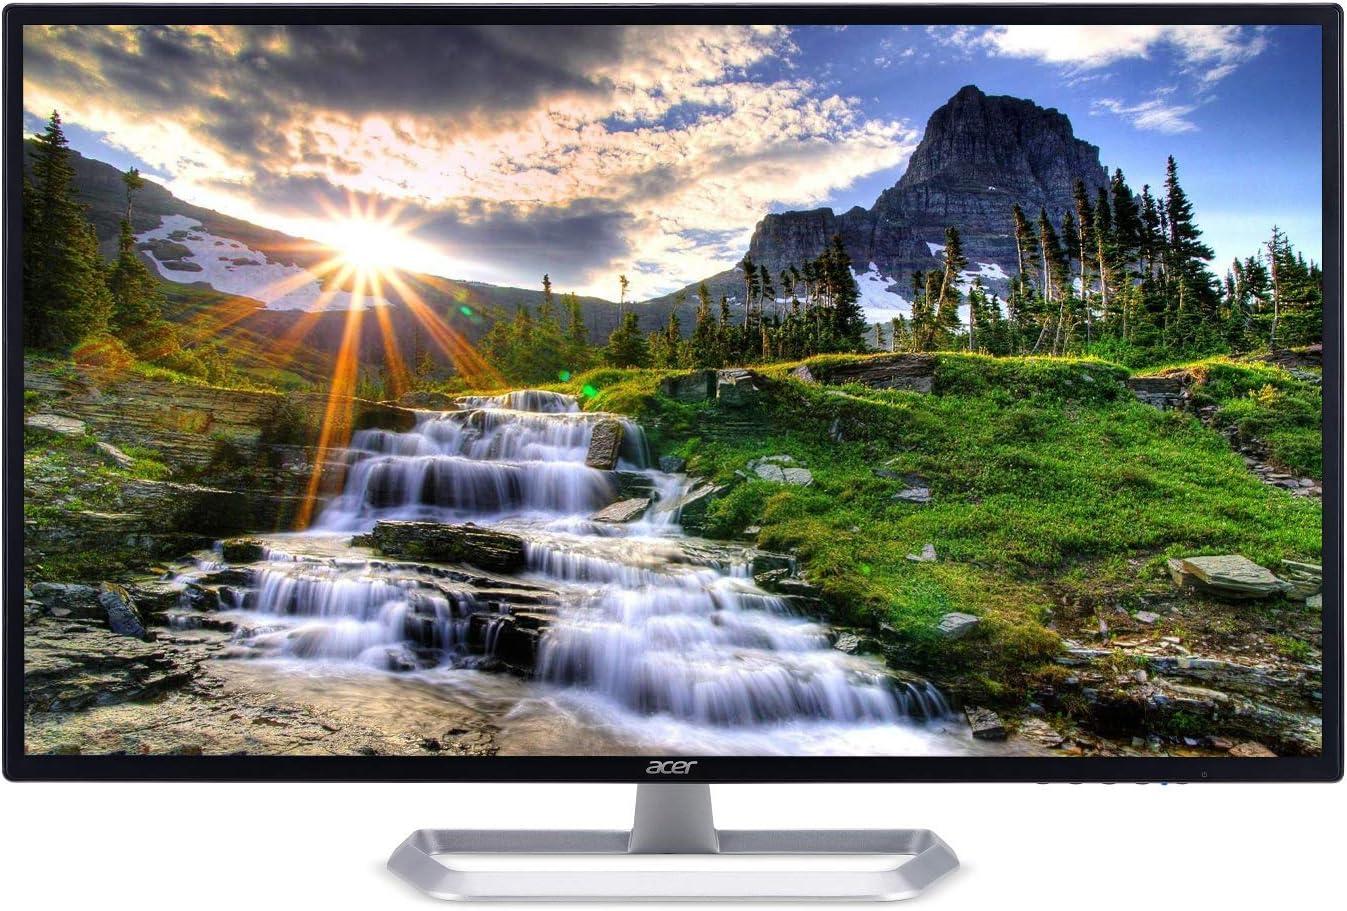 Amazon Com Acer Eb321hqu Cbidpx 31 5 Wqhd 2560 X 1440 Ips Monitor Display Port Hdmi Dvi Port Black Computers Accessories